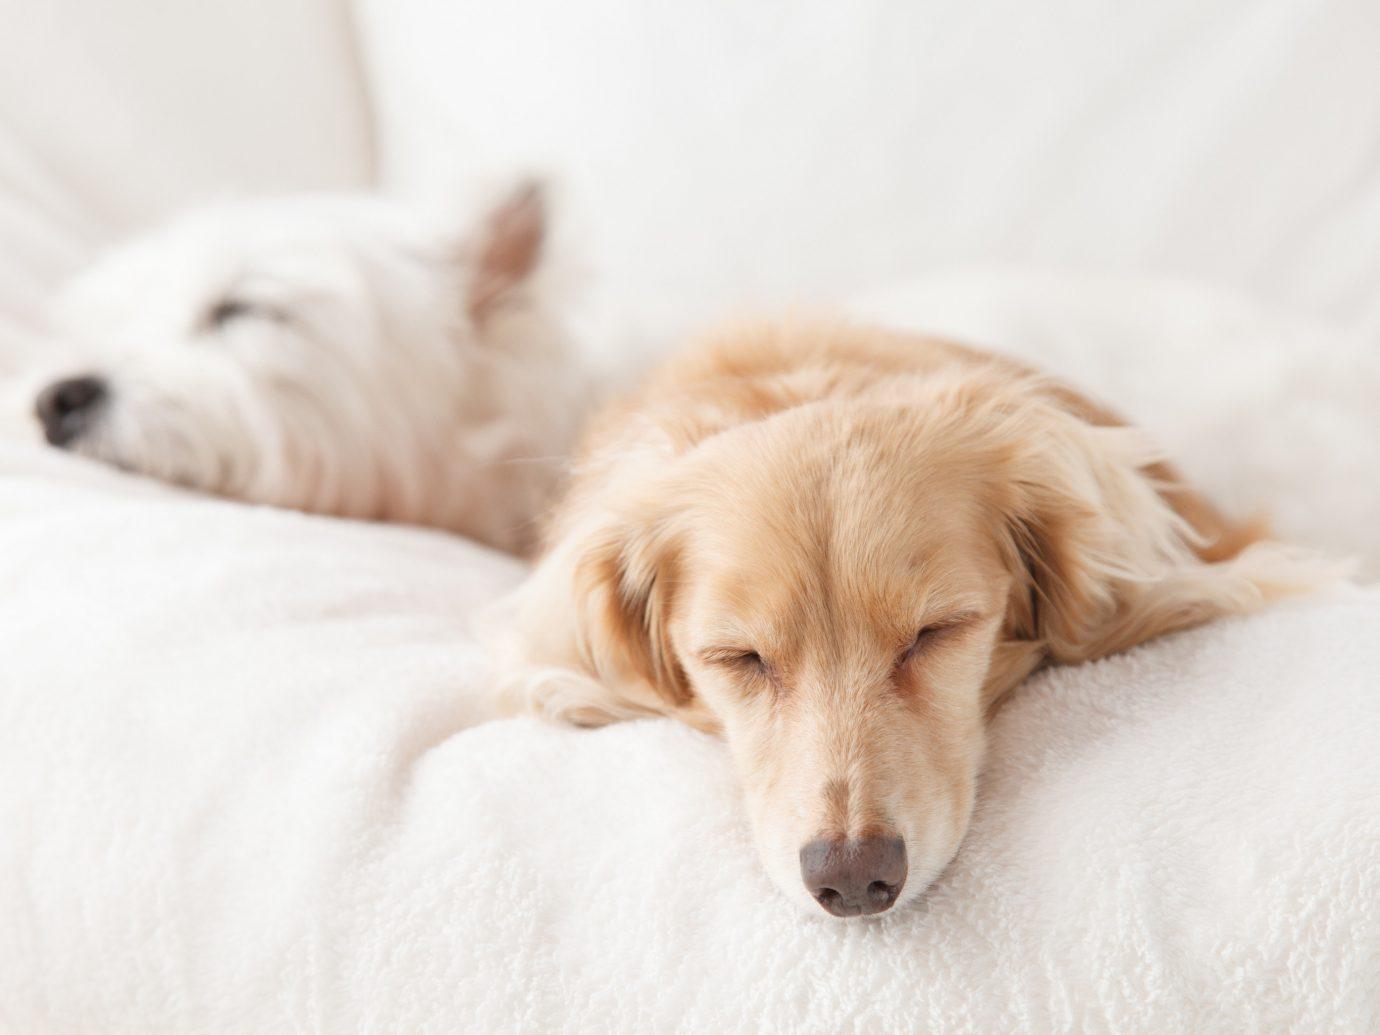 Hotels Dog indoor laying white mammal vertebrate dog breed animal puppy bed dog like mammal